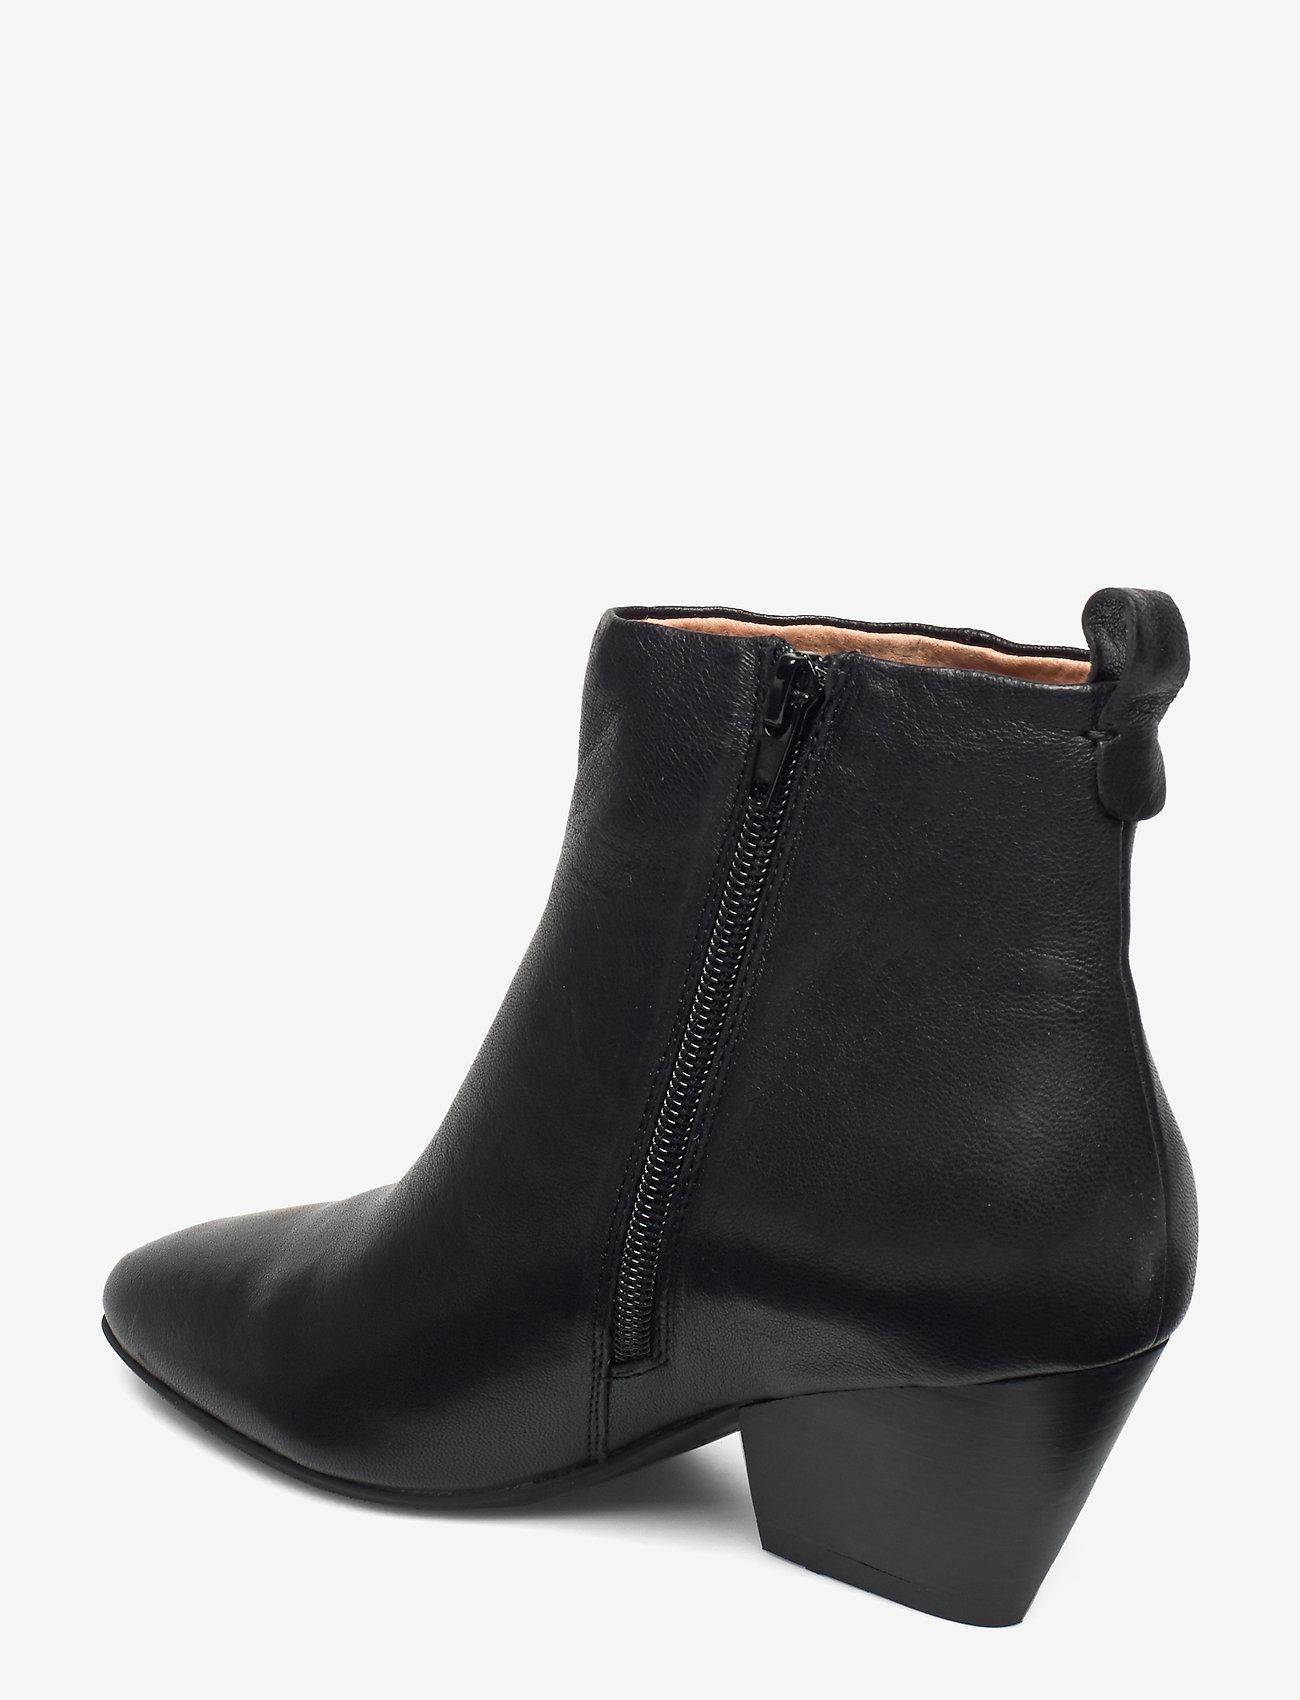 Särskild rabattCleo L Black 929.40 Shoe The Bear nl8cx 6EaPH